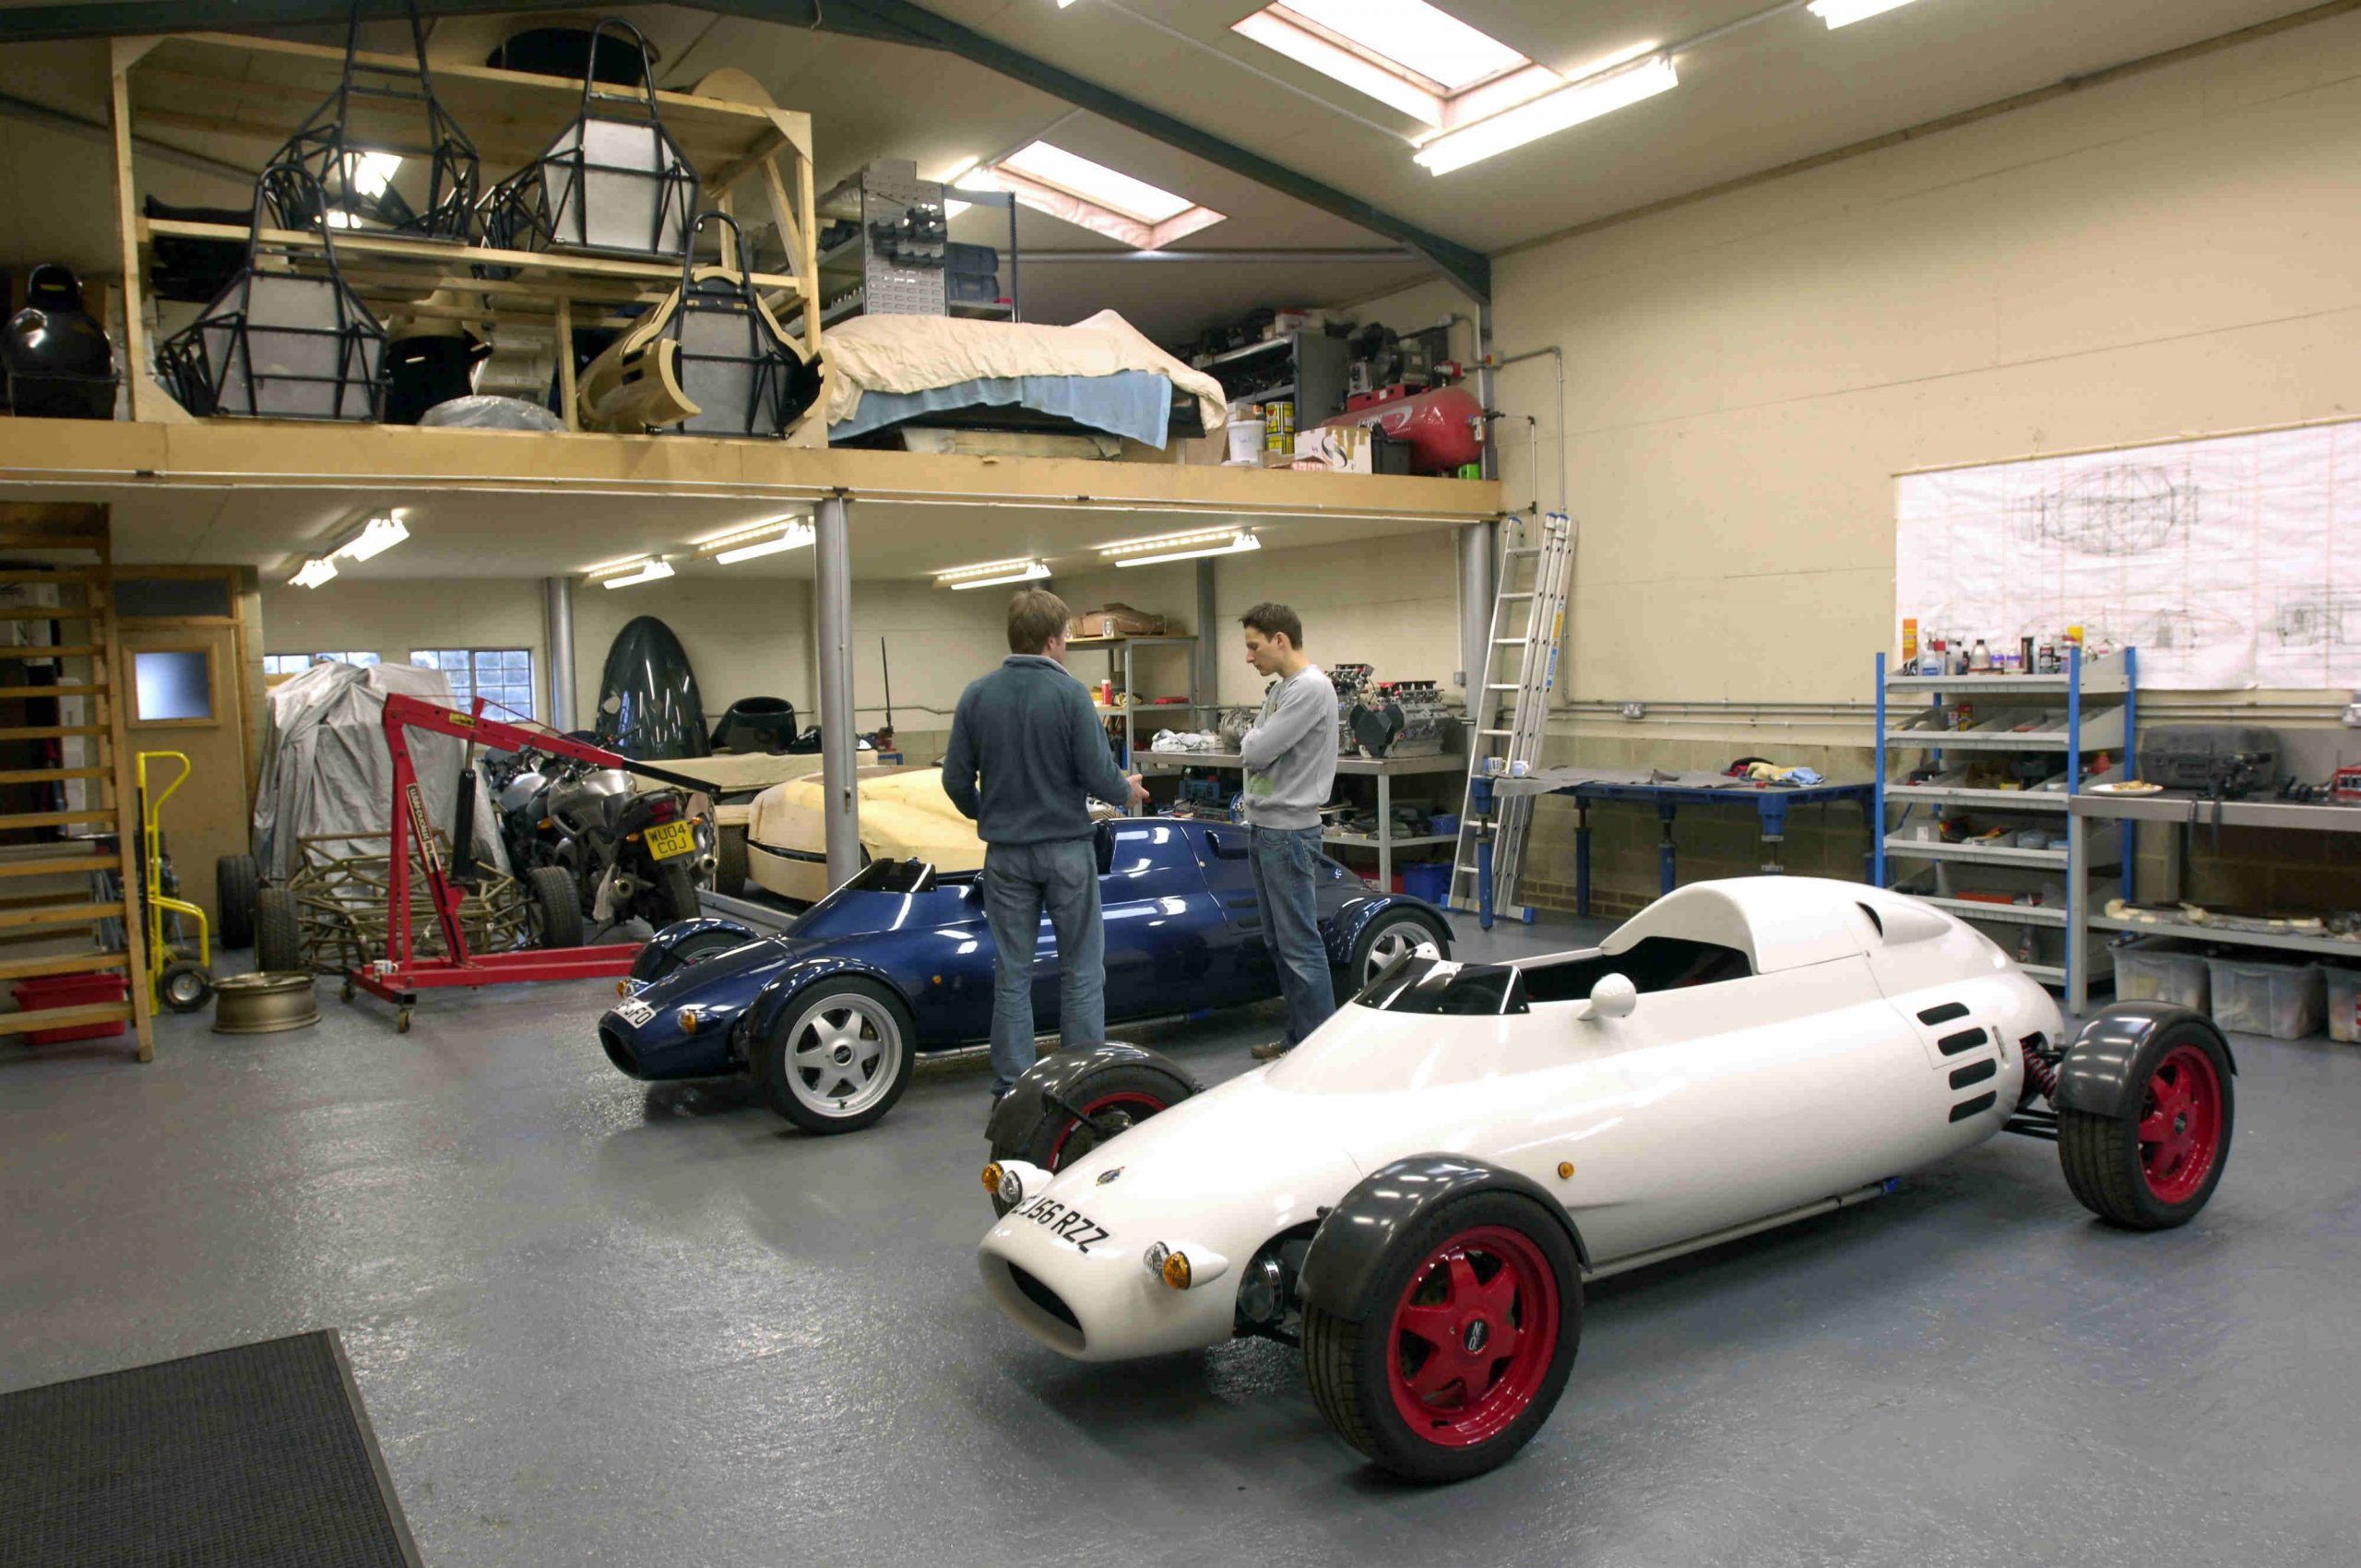 Rocket cars parked in garage